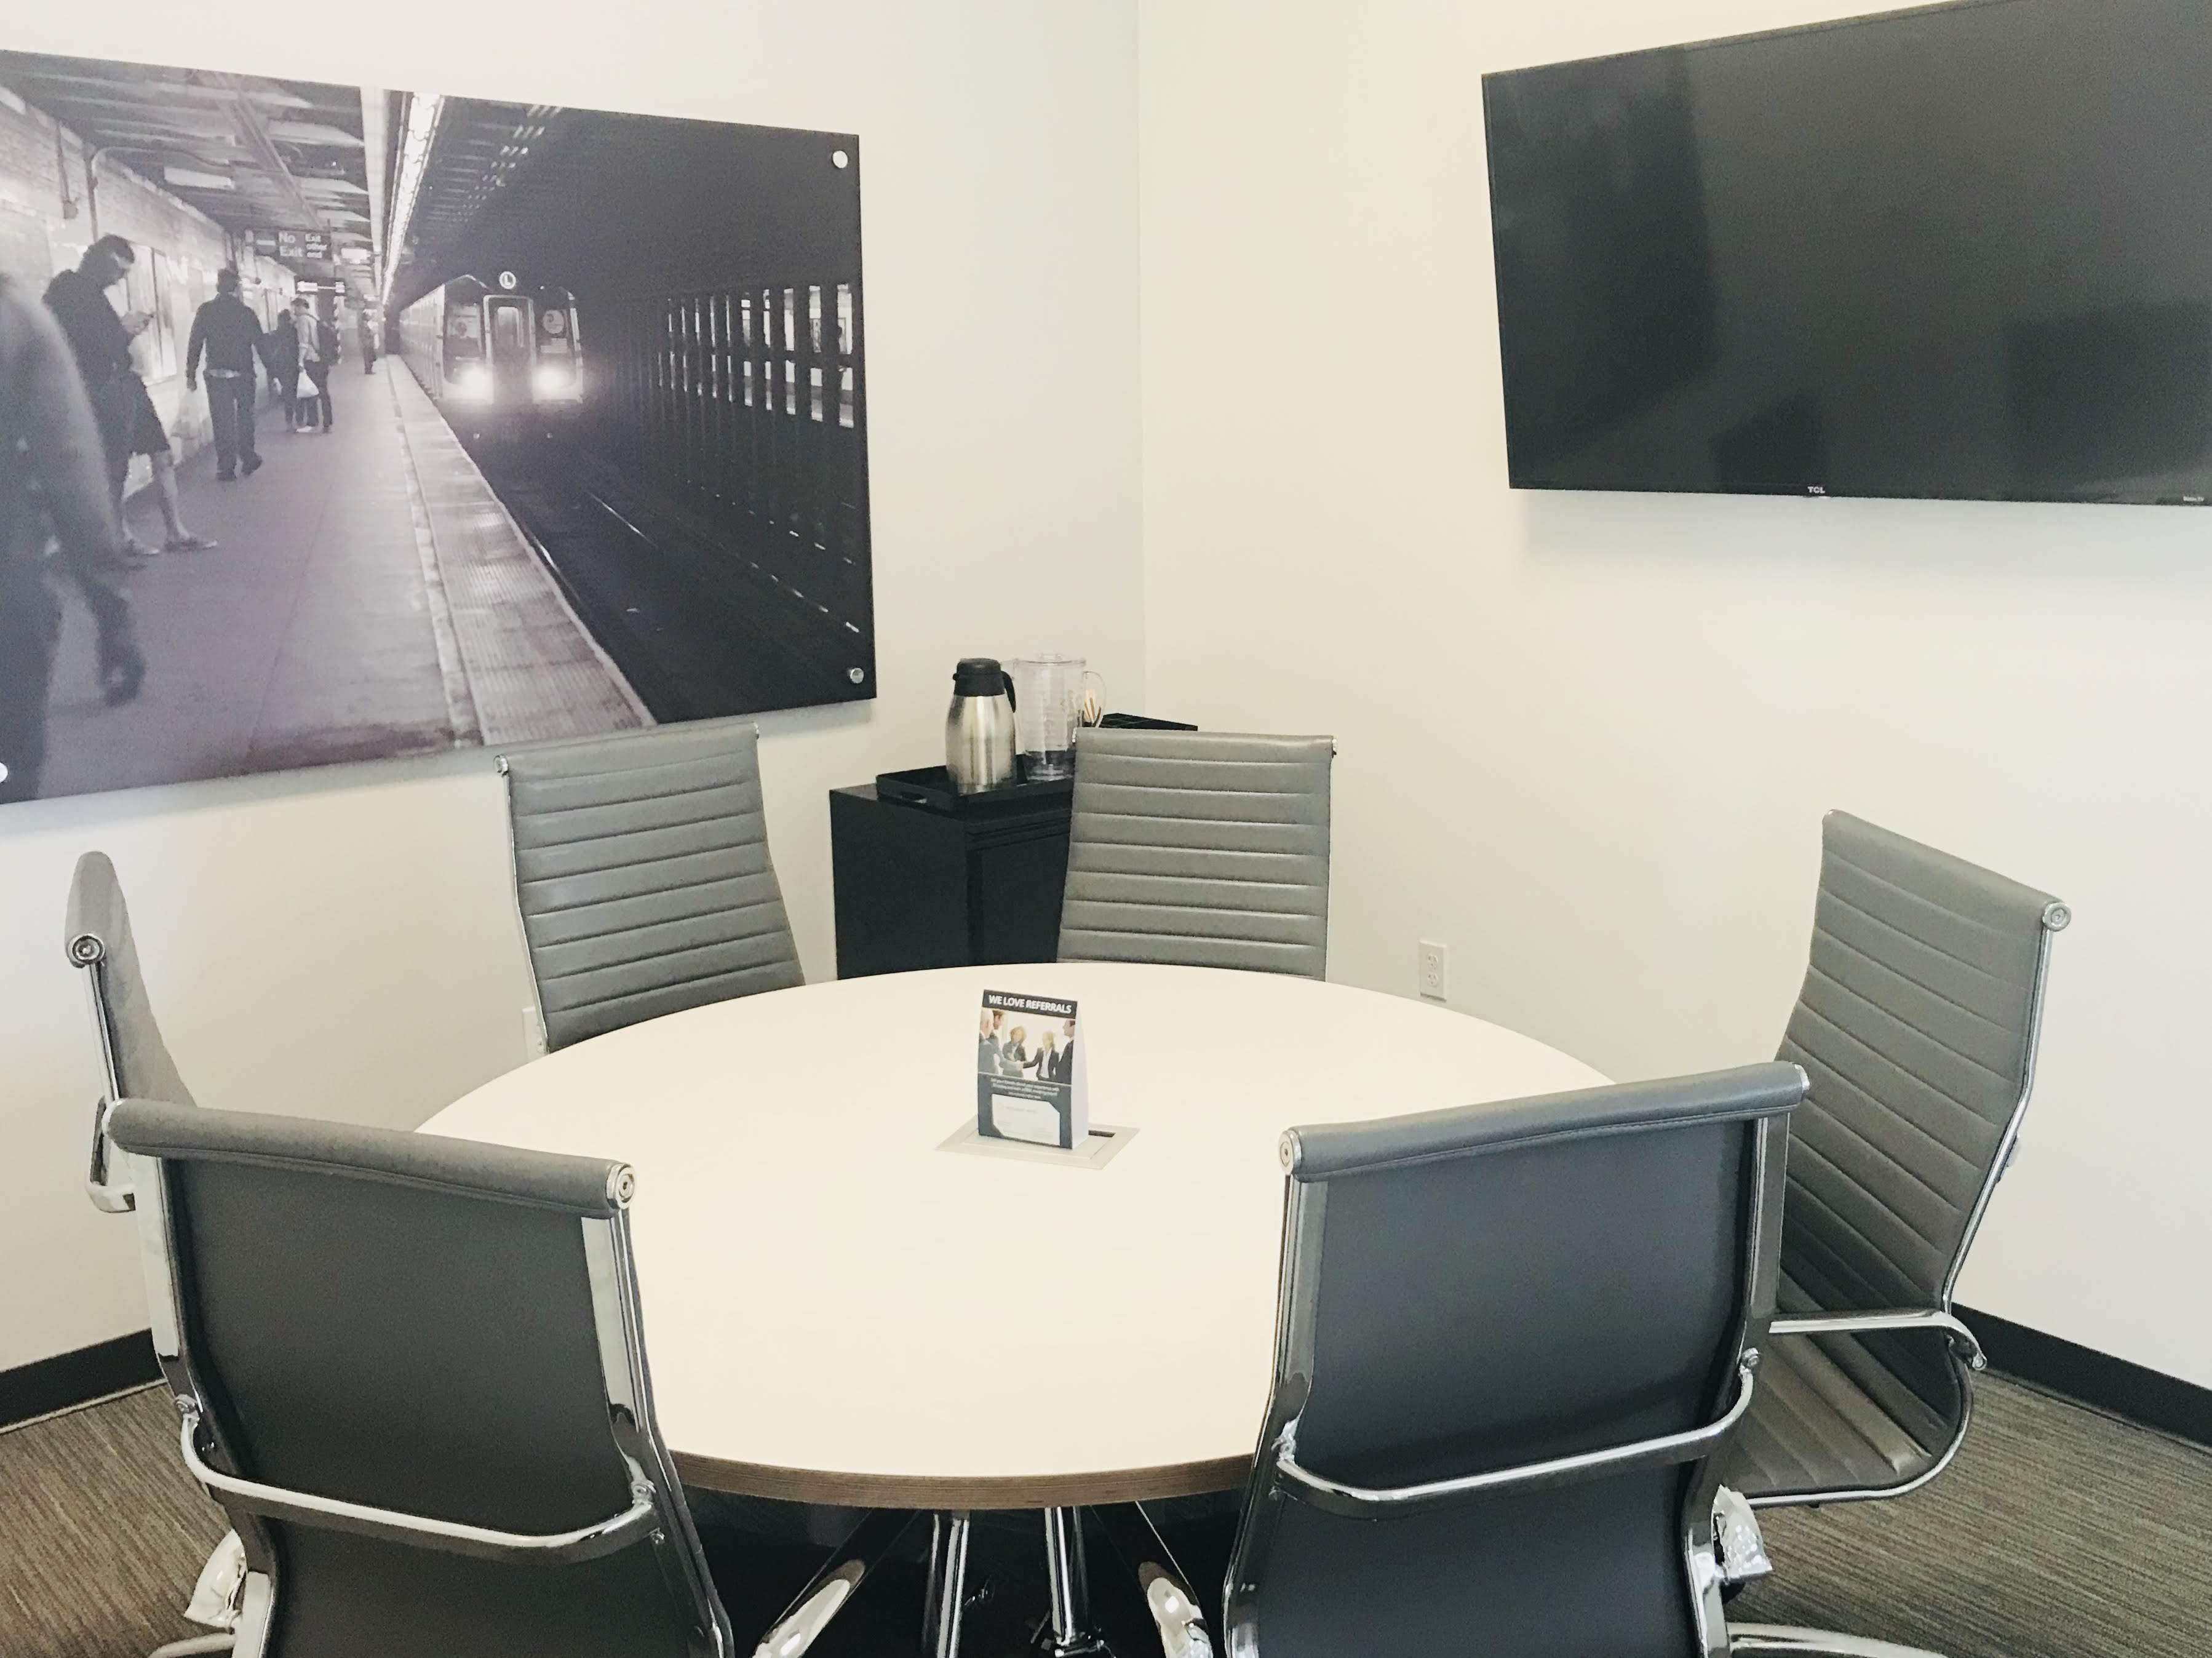 Intelligent Office Edinburg - Conference Room A